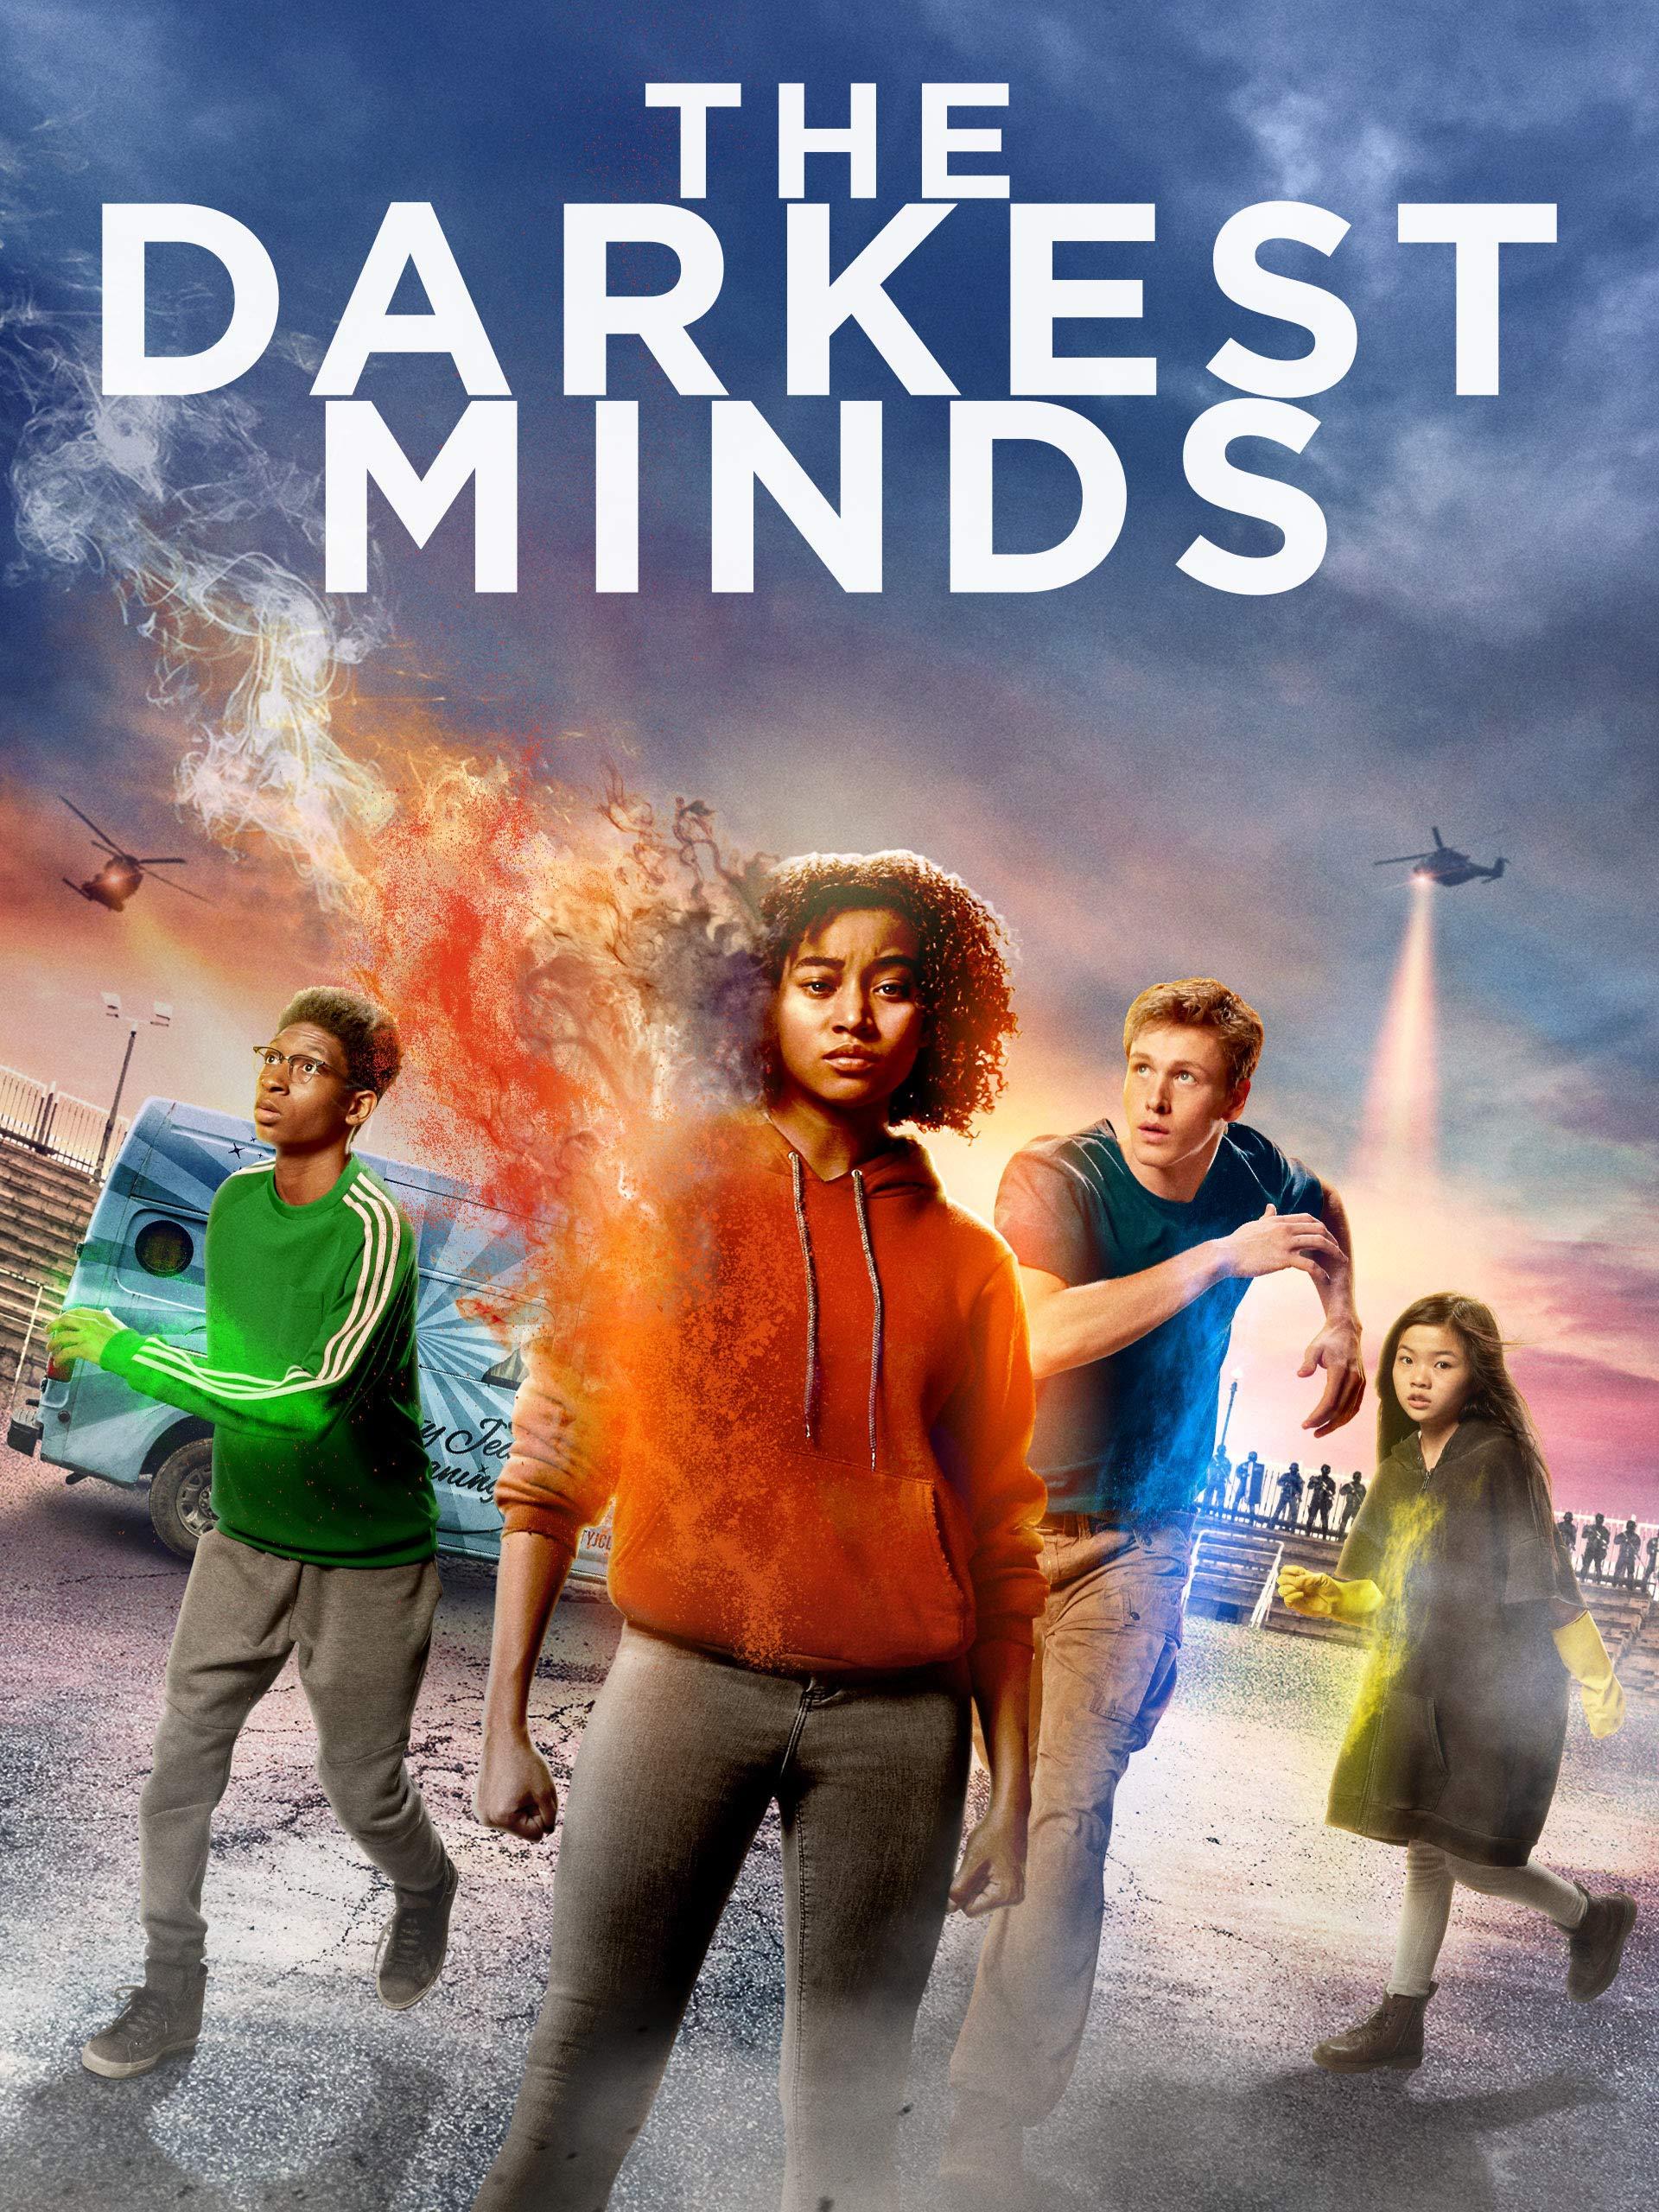 Watch The Darkest Minds Prime Video